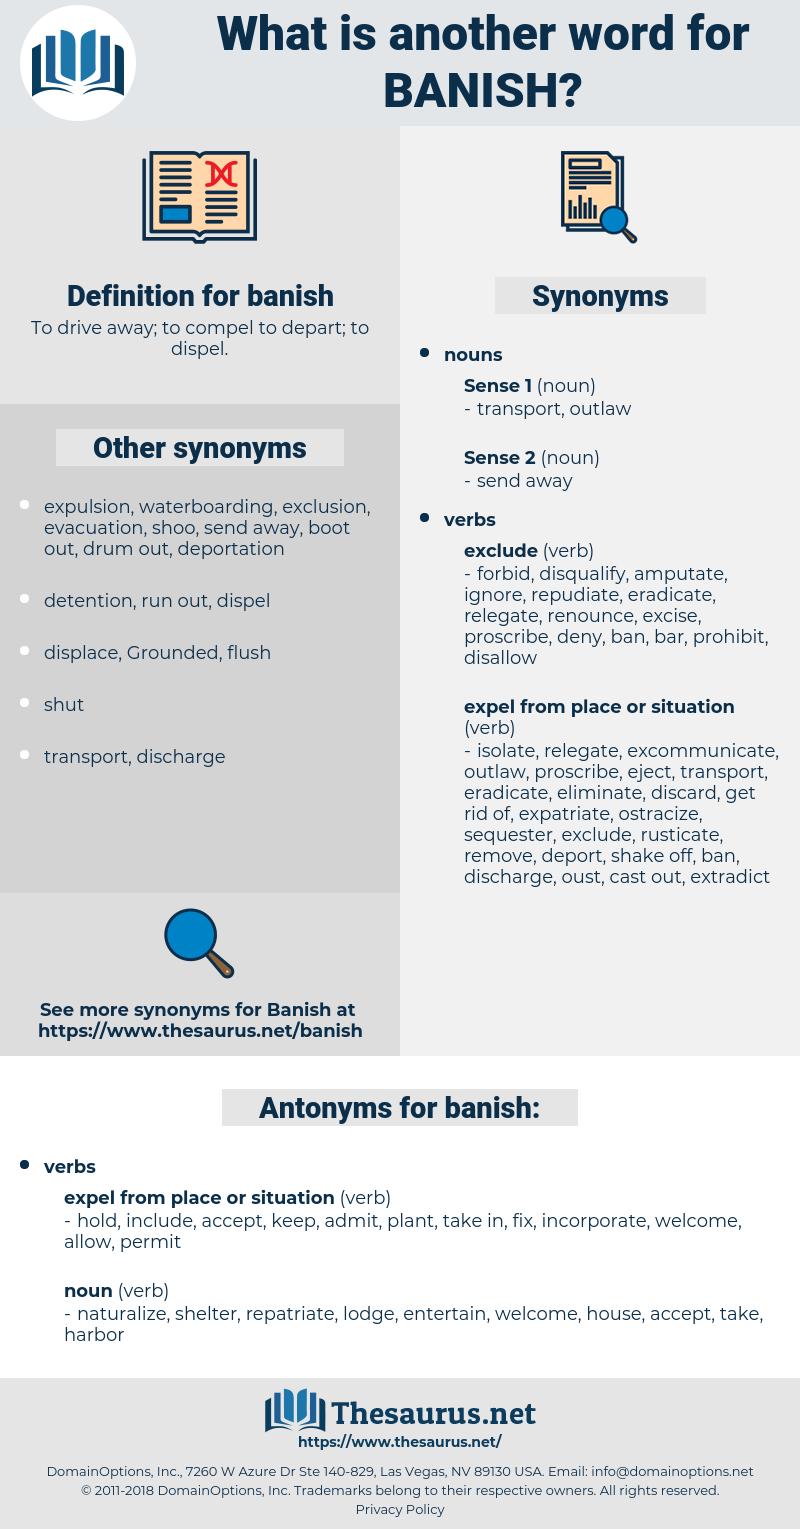 banish, synonym banish, another word for banish, words like banish, thesaurus banish